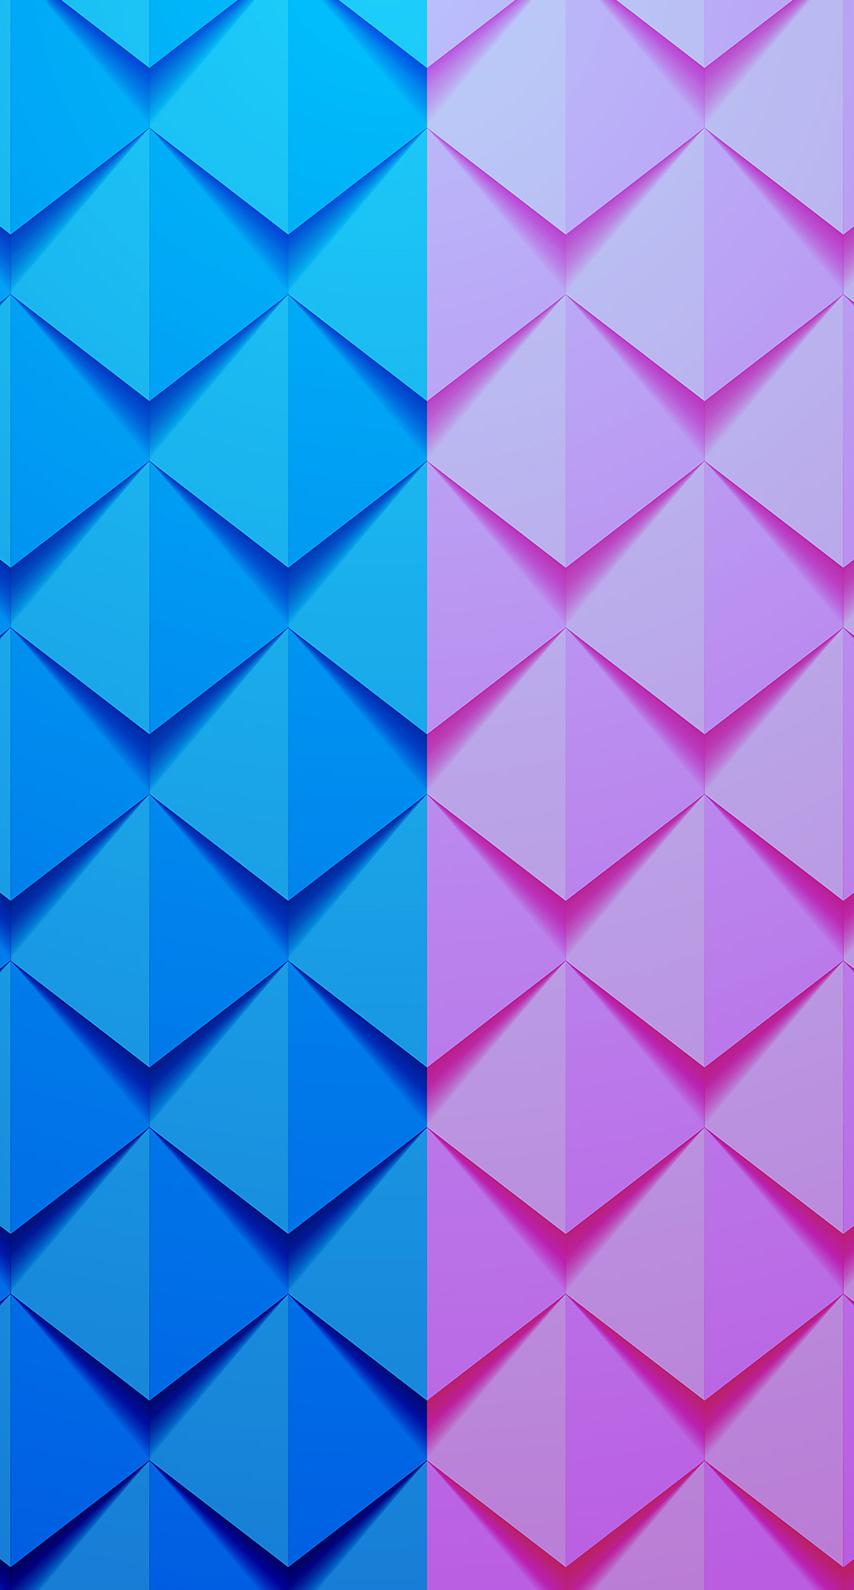 shape, graphic design, decoration, creativity, square, vector, seamless, triangle, repetition